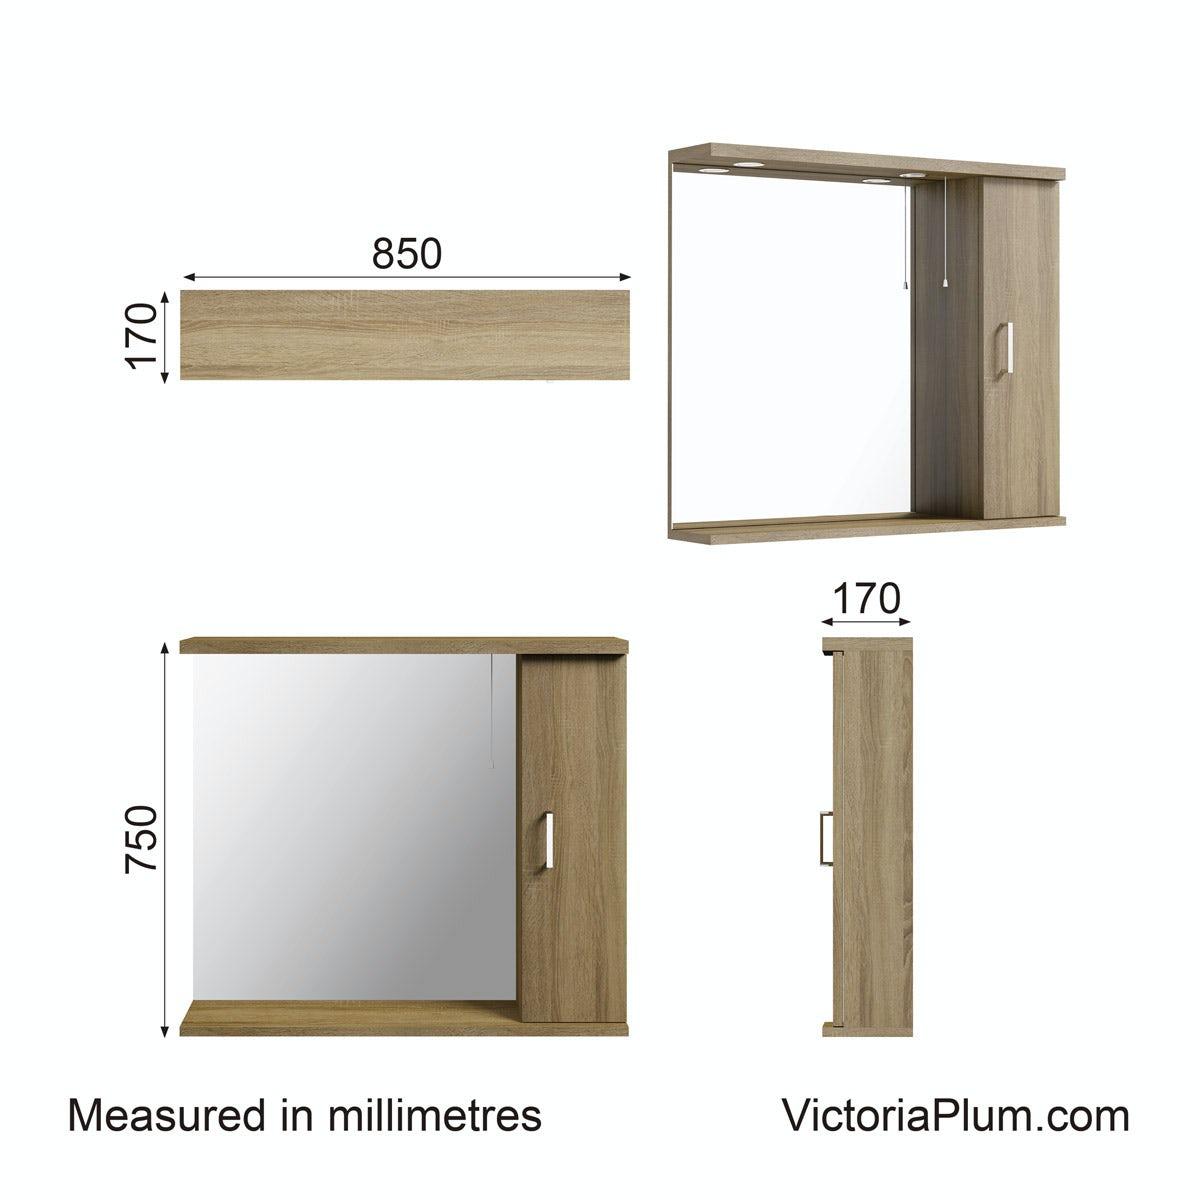 Dimensions for Orchard Eden oak illuminated mirror 850mm